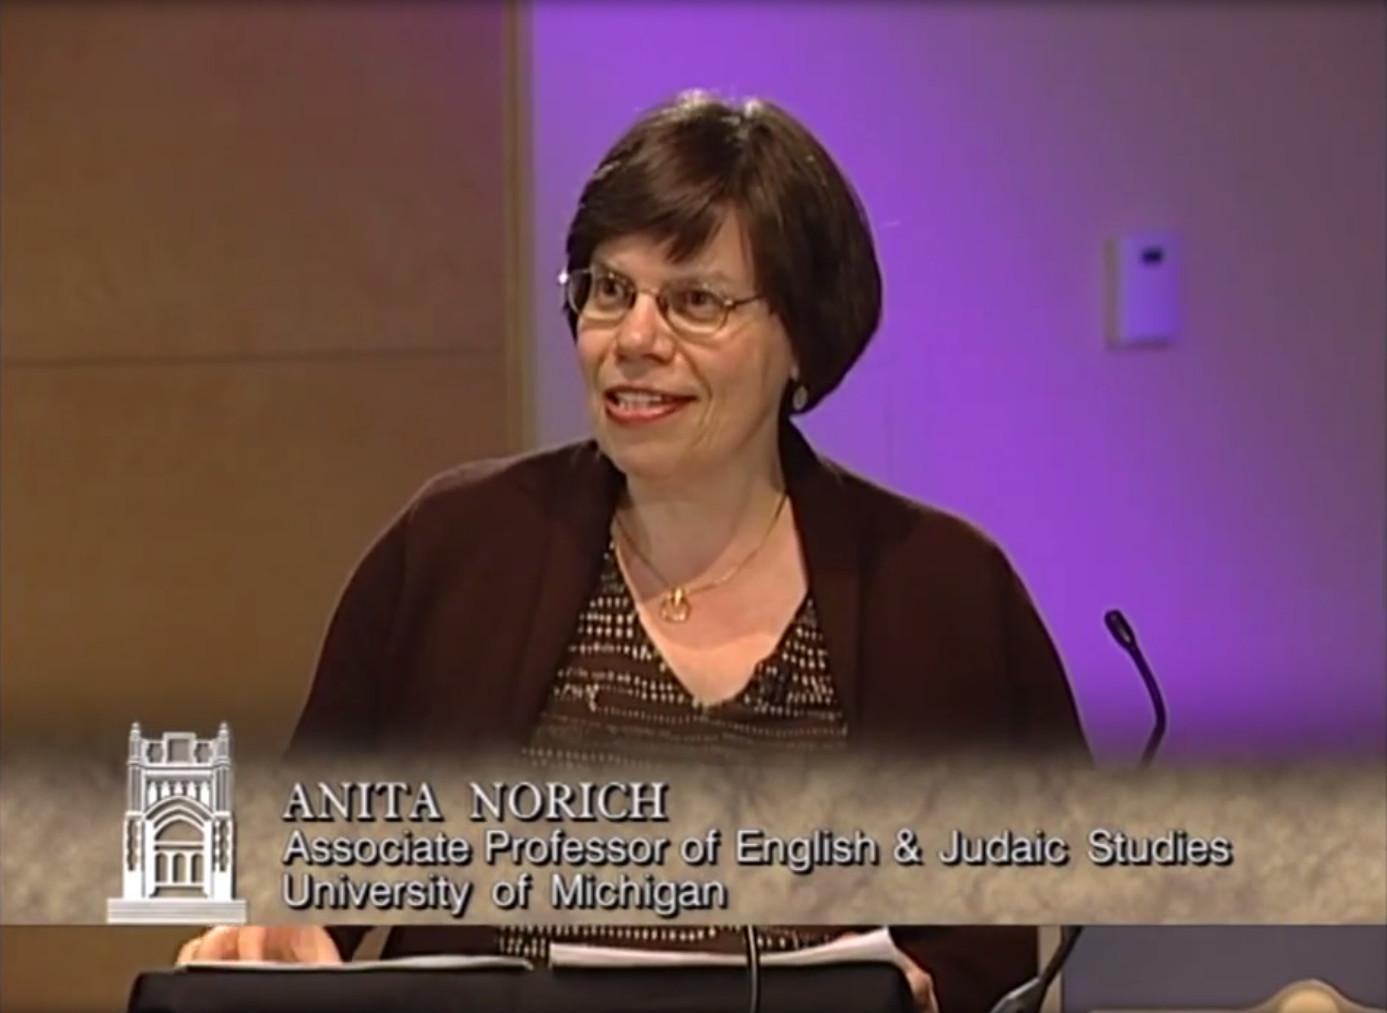 Anita Norich: Translating Yiddish in the 20th Century